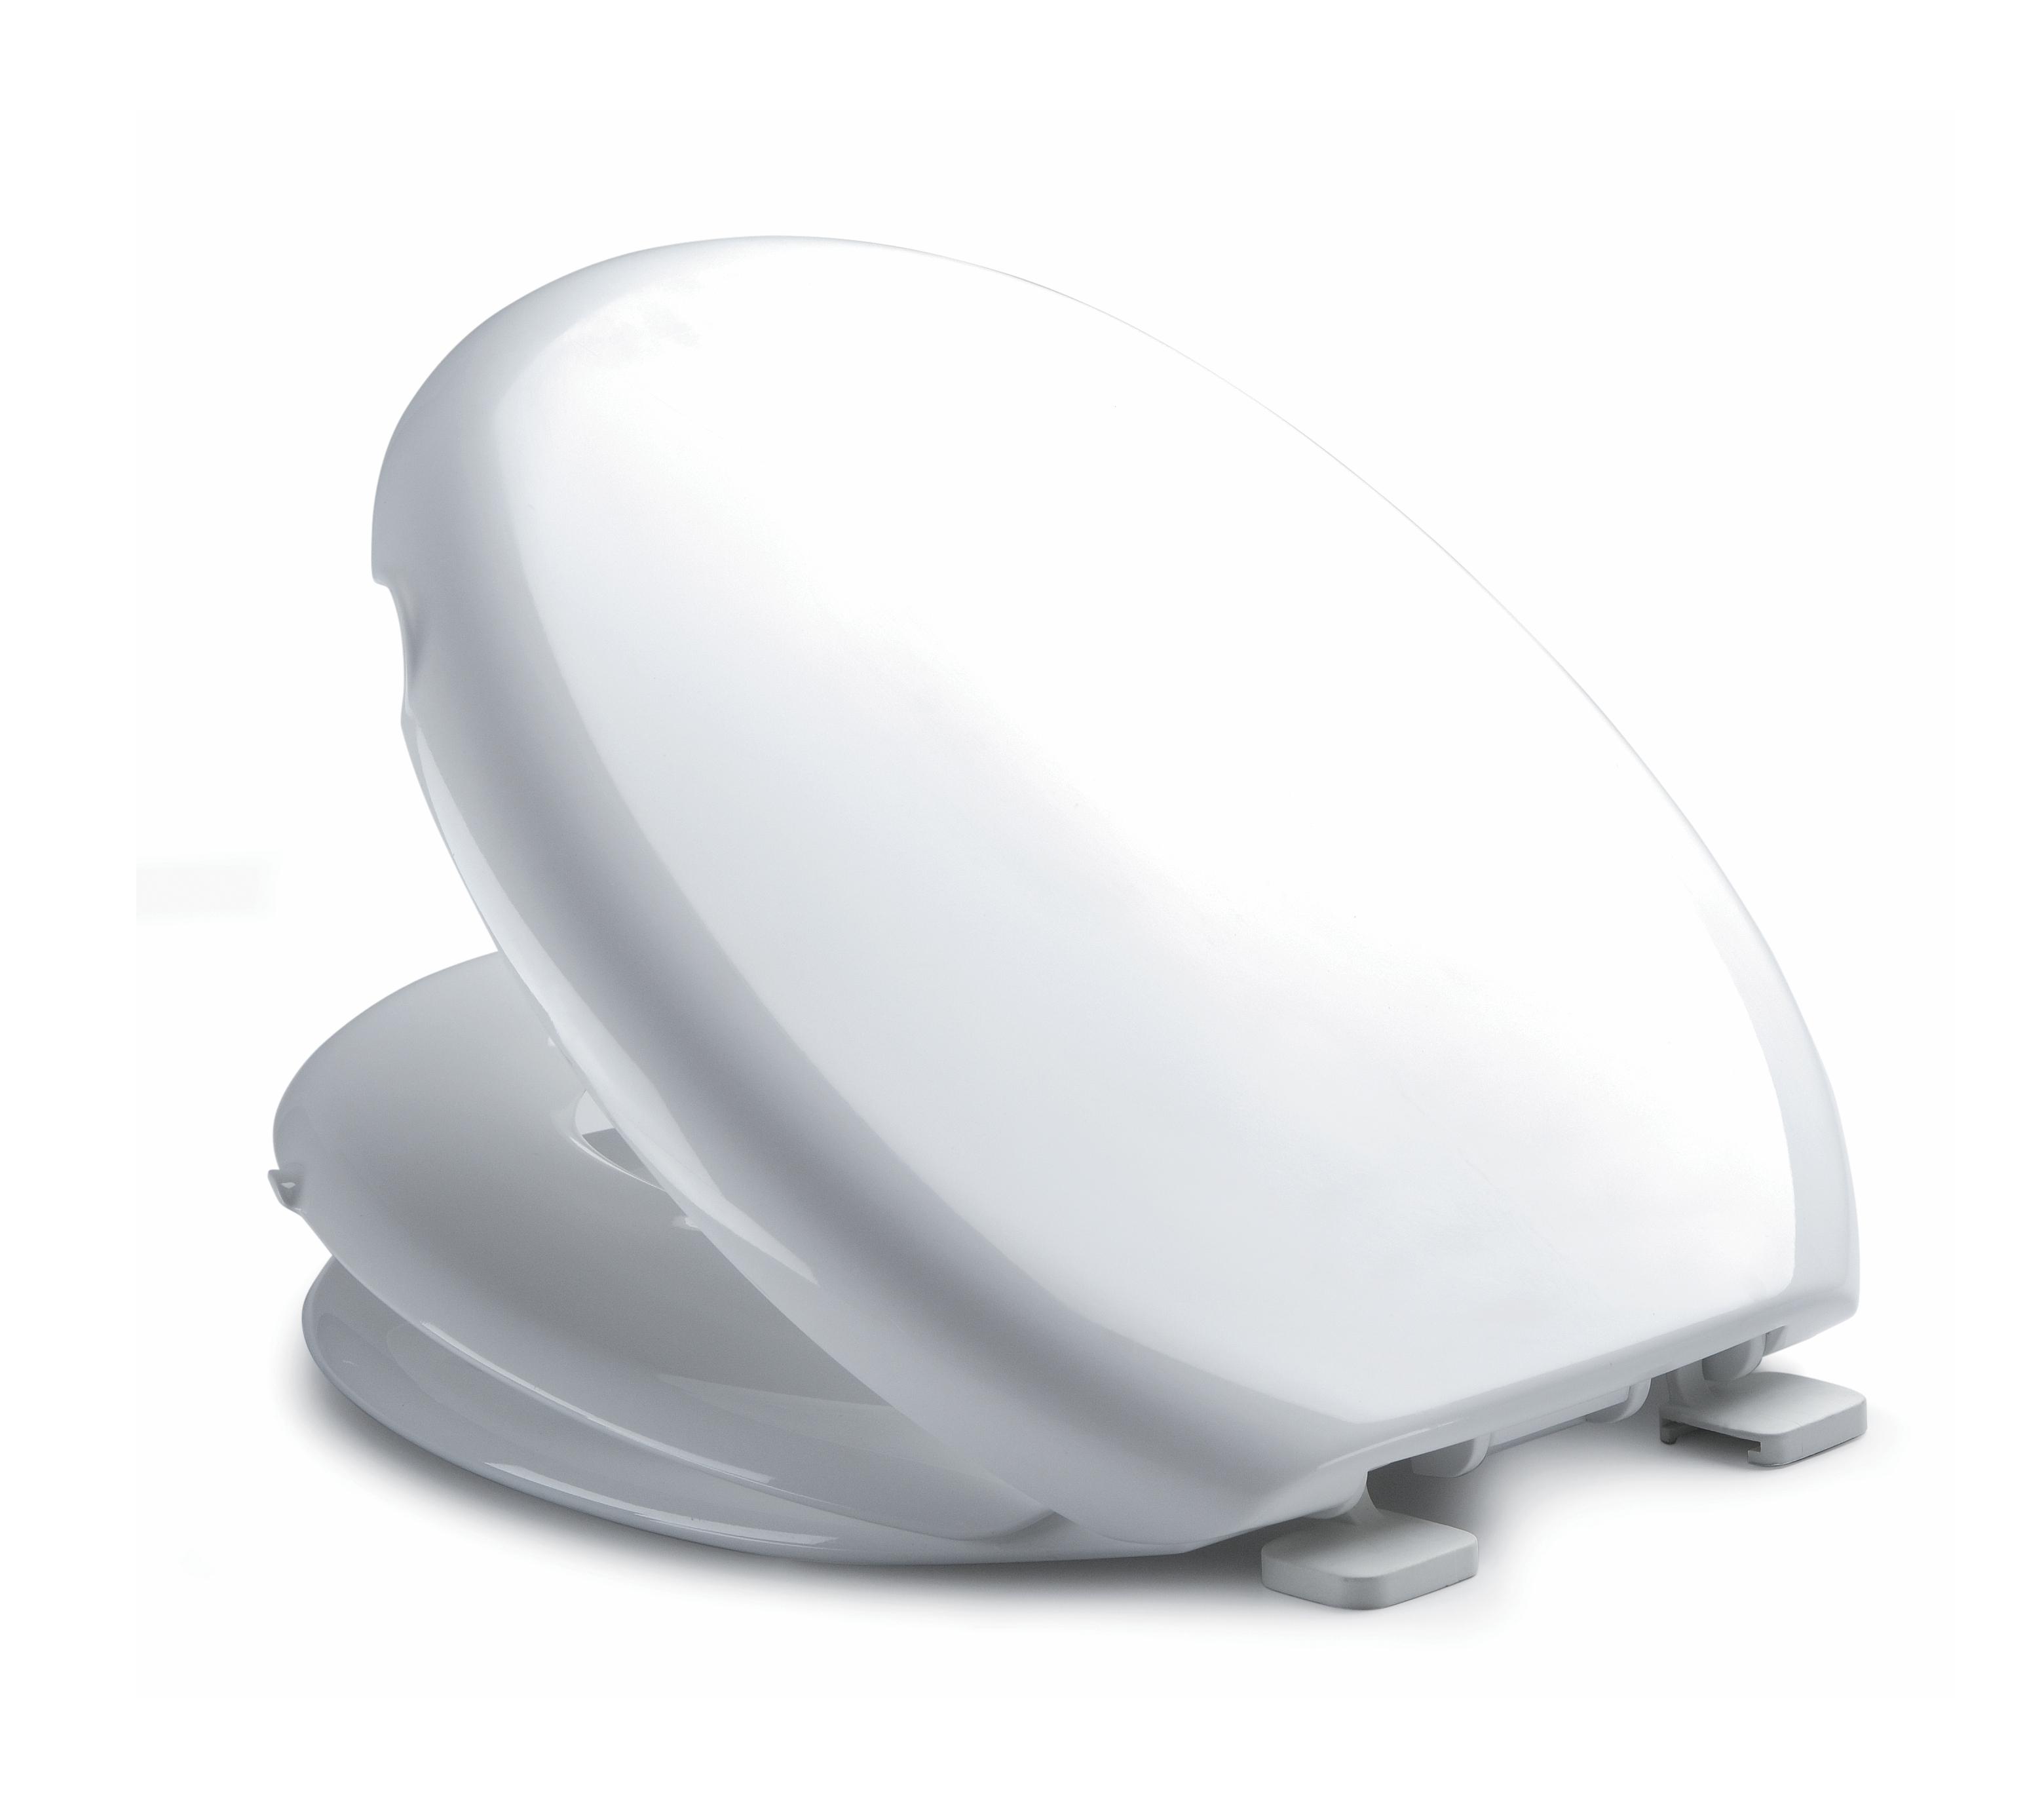 Capac WC cu reductor pentru copii Metaform Baby`n Family